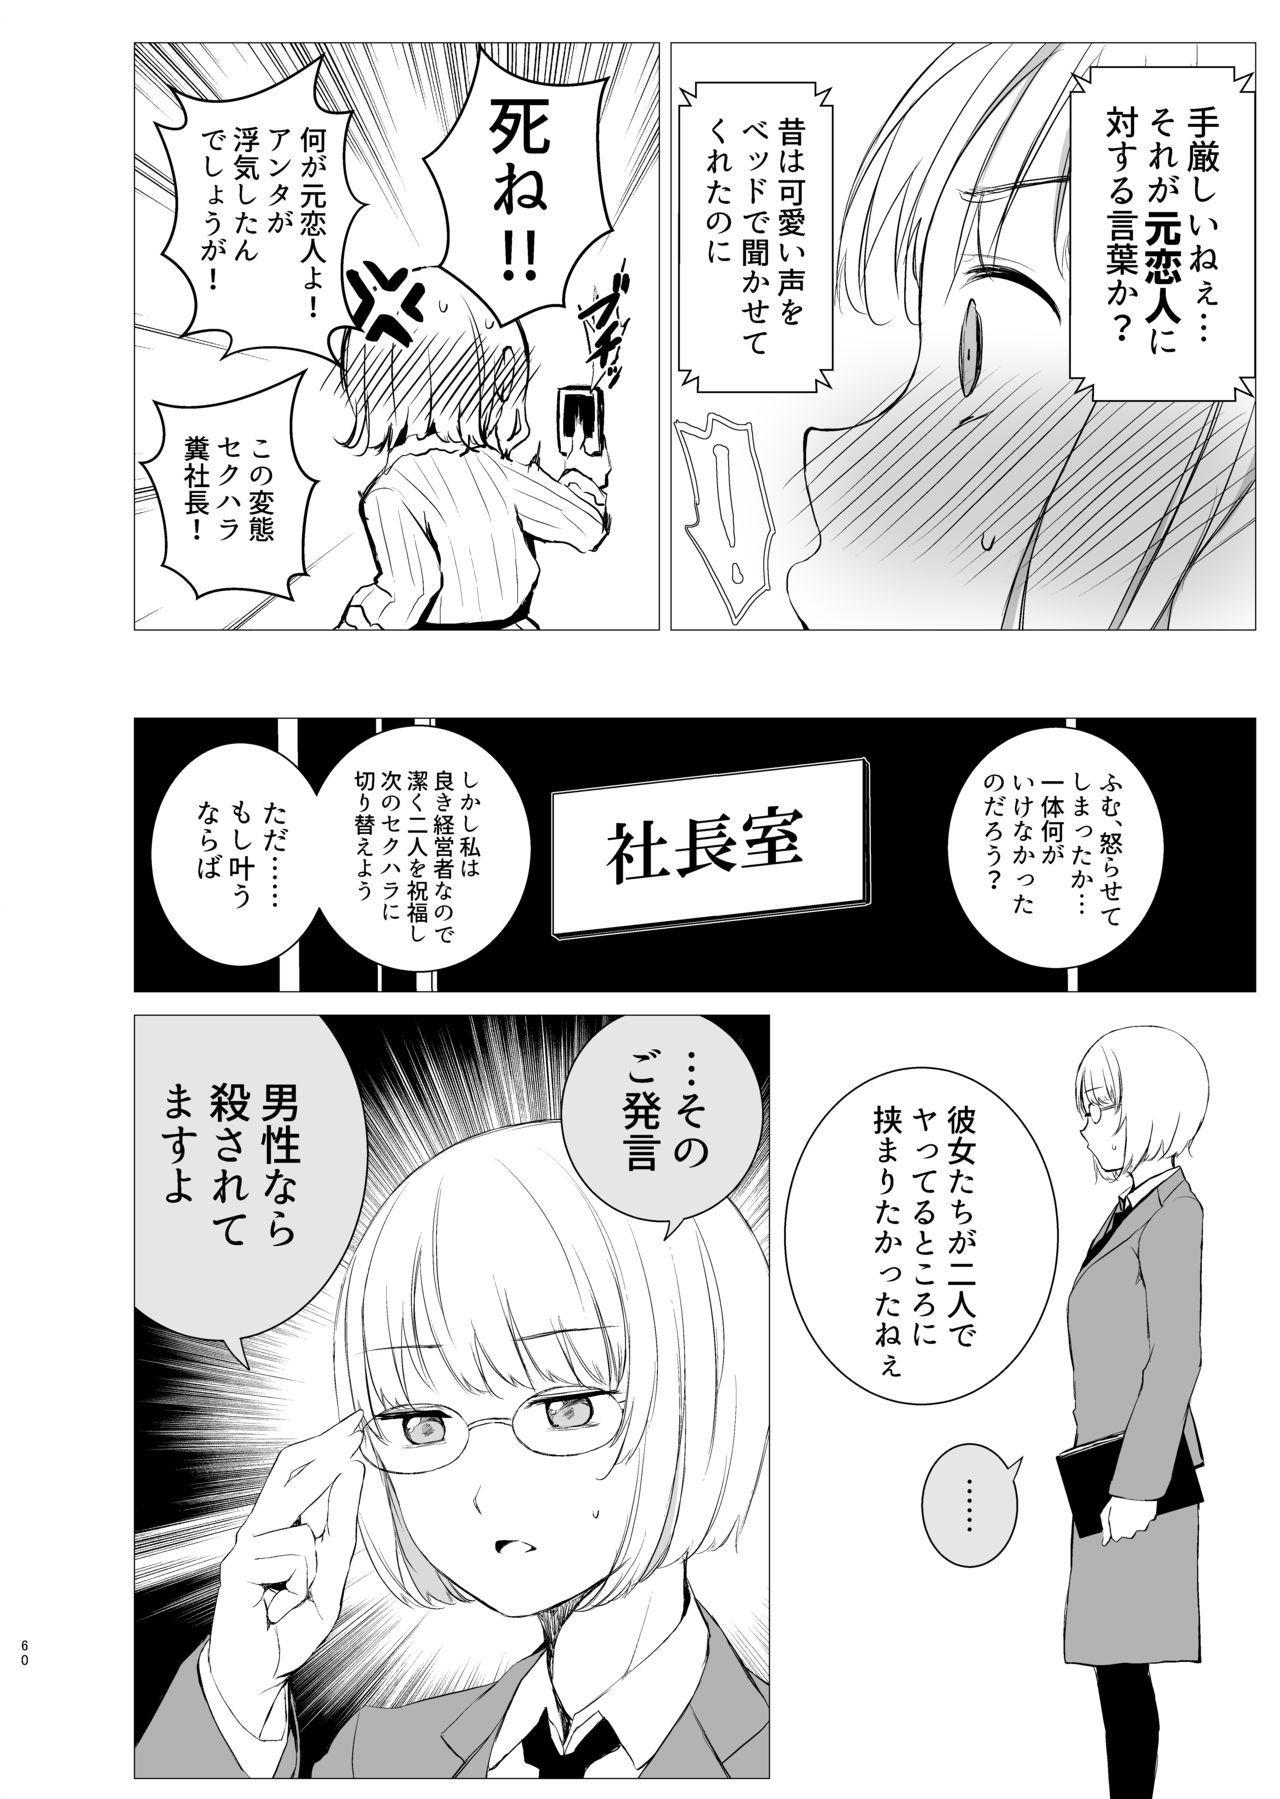 Hanayomi no Makurakotoba 58